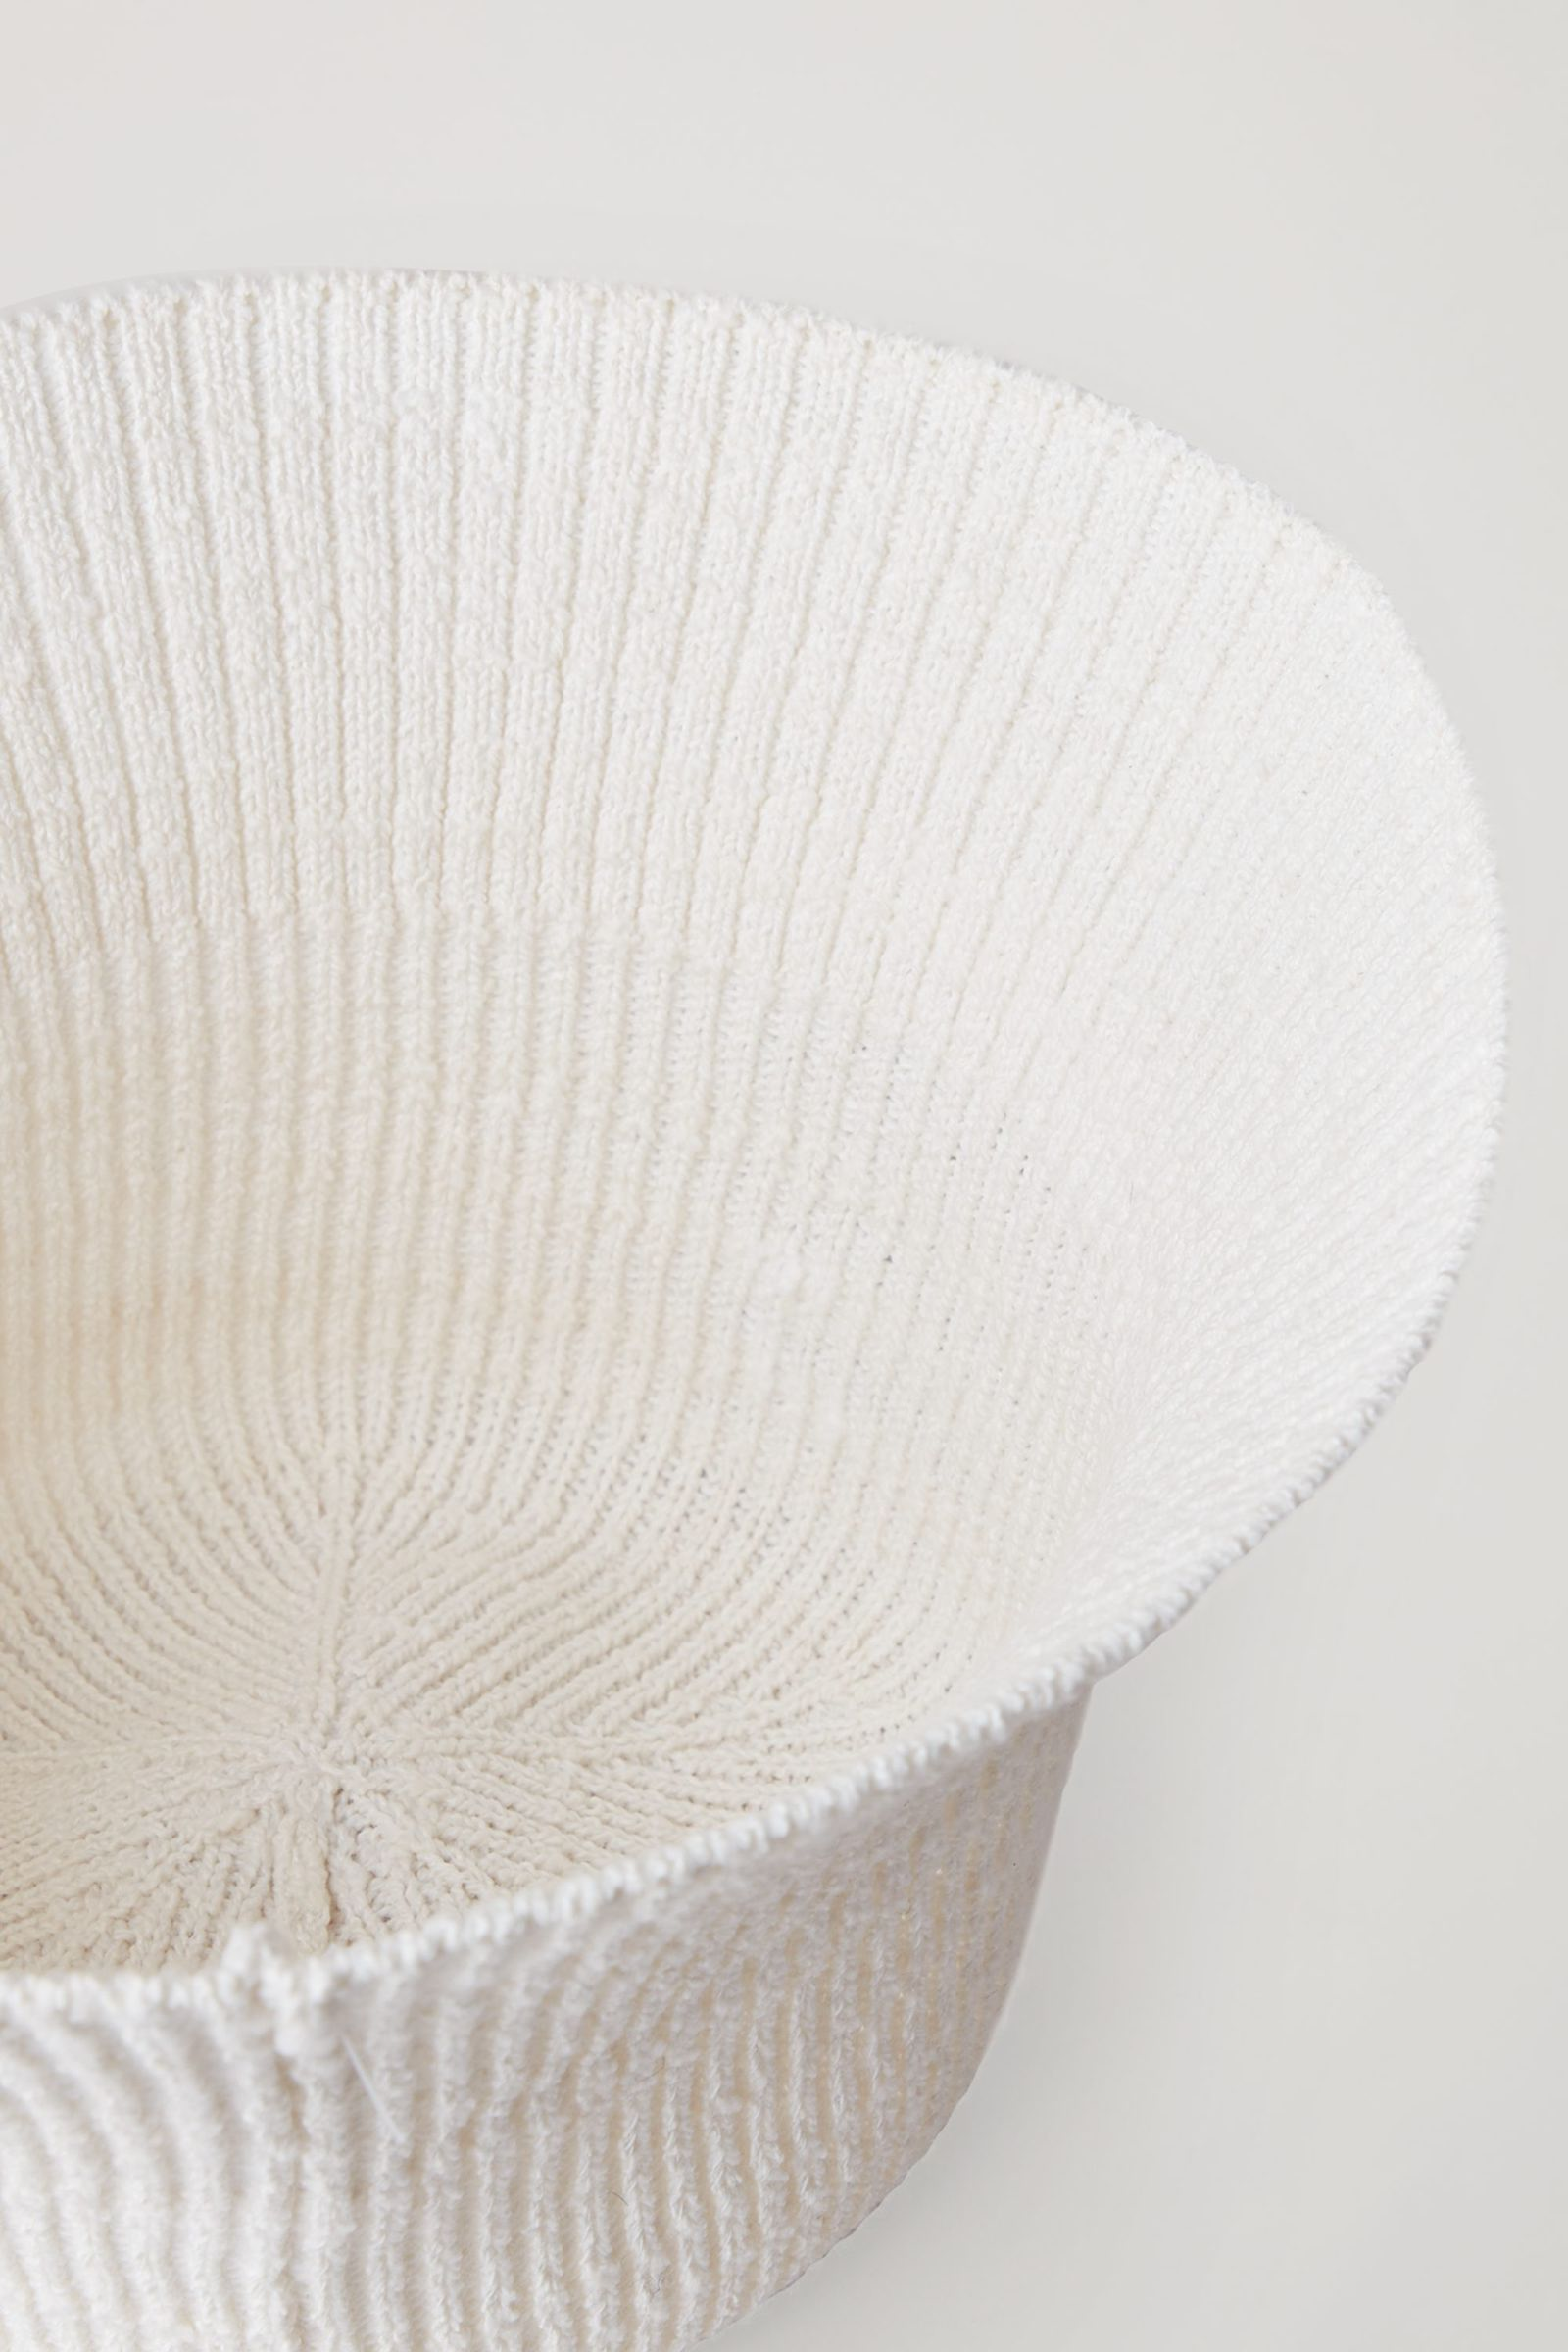 COS 니티드 버킷 햇의 화이트컬러 Detail입니다.